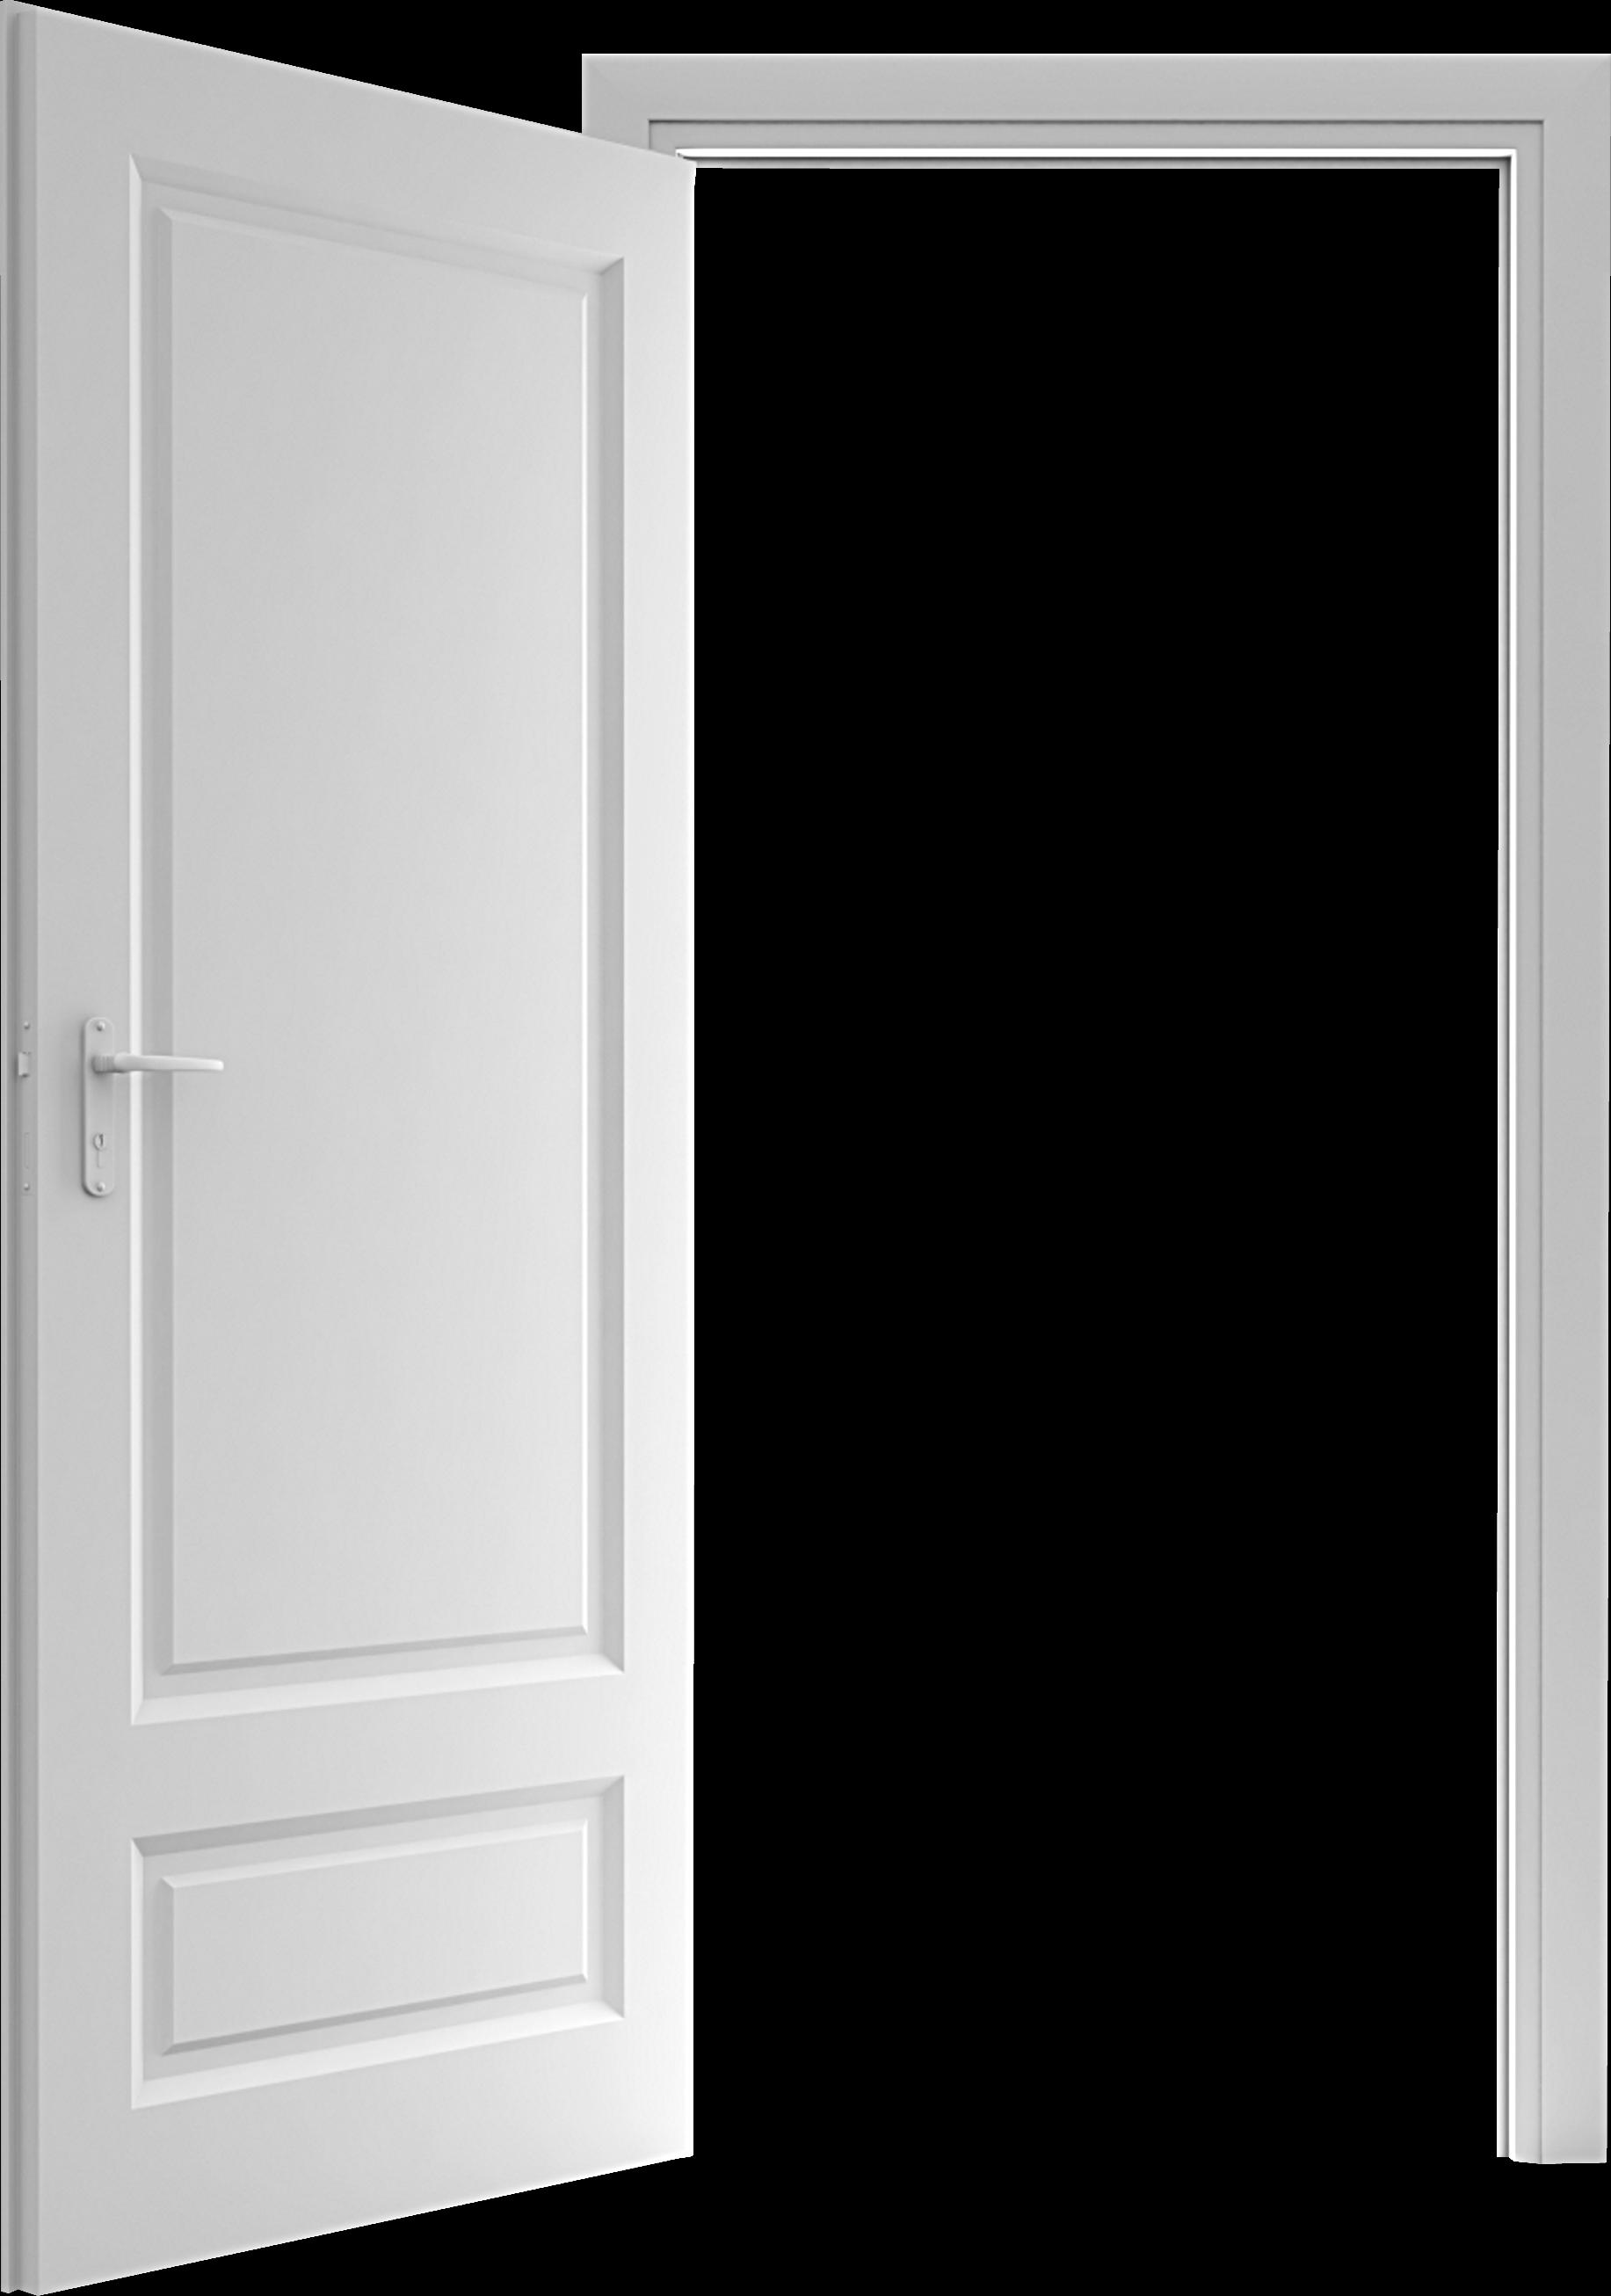 Download White Door Png Home Door Png Image With No Background Pngkey Com